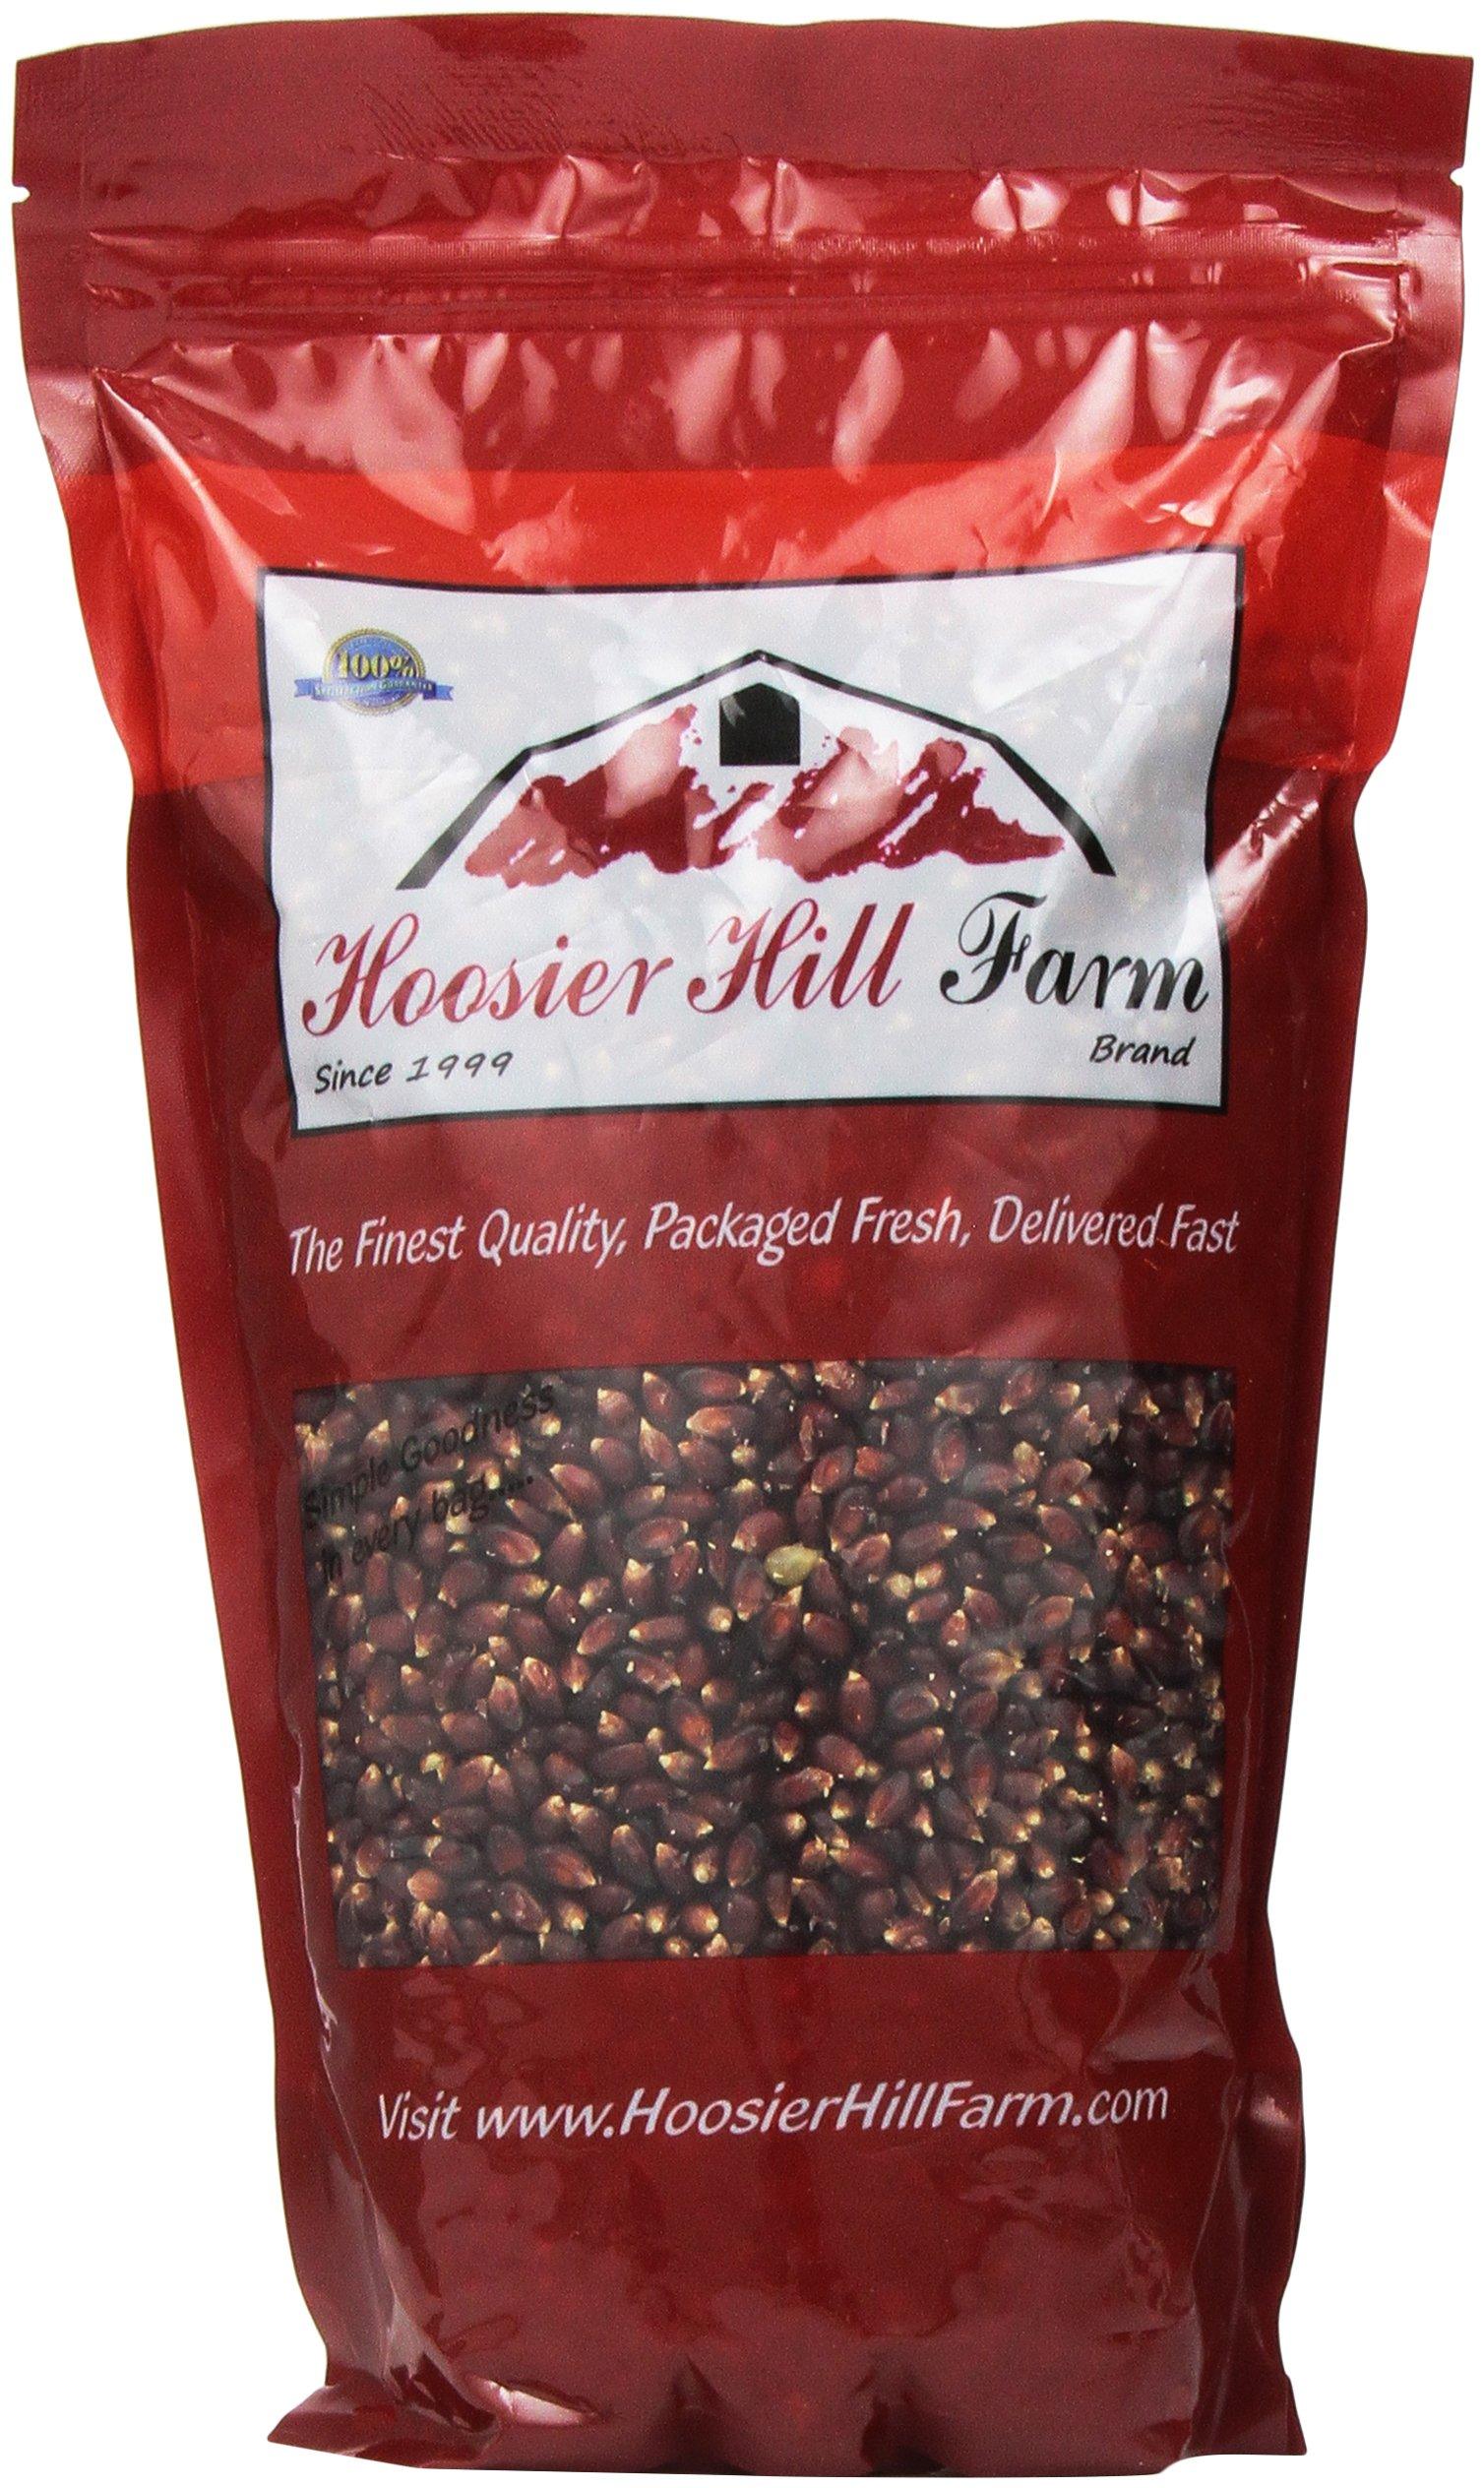 Hoosier Hill Farm Gourmet Popcorn, Ruby Red, 3 Pound